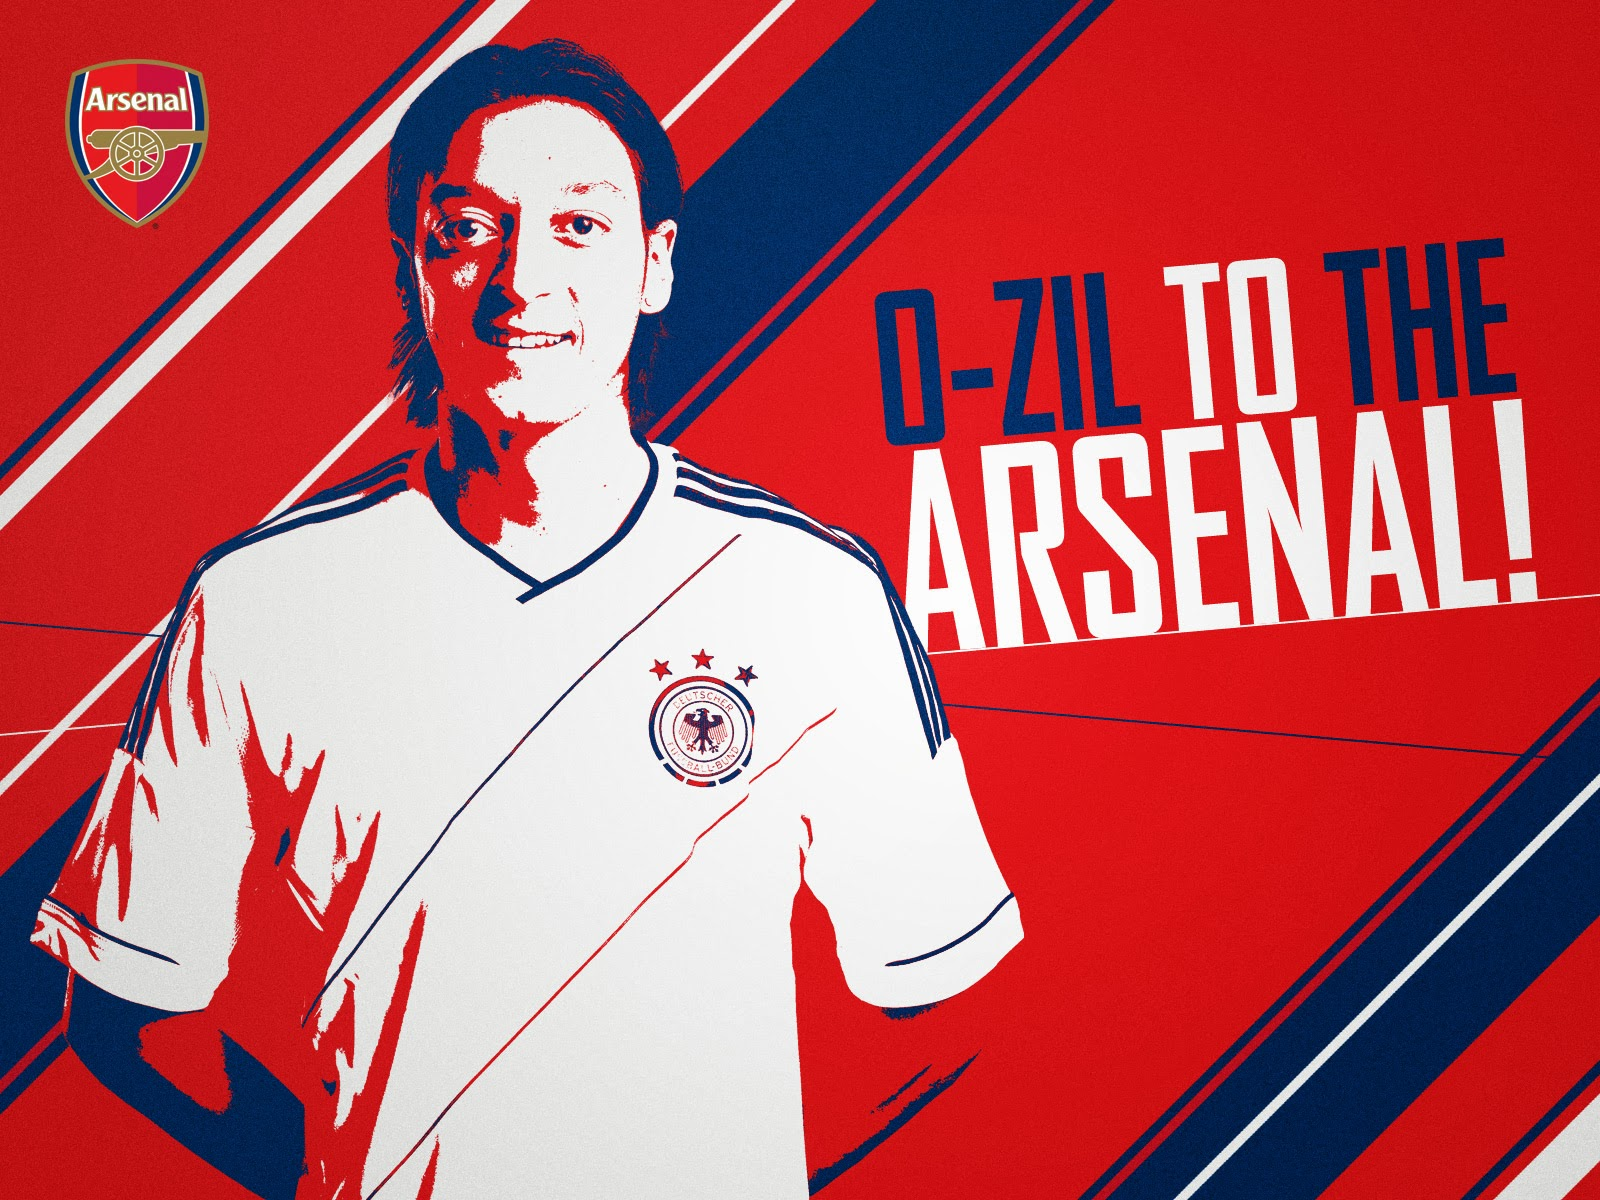 Mesut Ozil Arsenal 2014 The Gunner HD Desktop Wallpaper 1600x1200